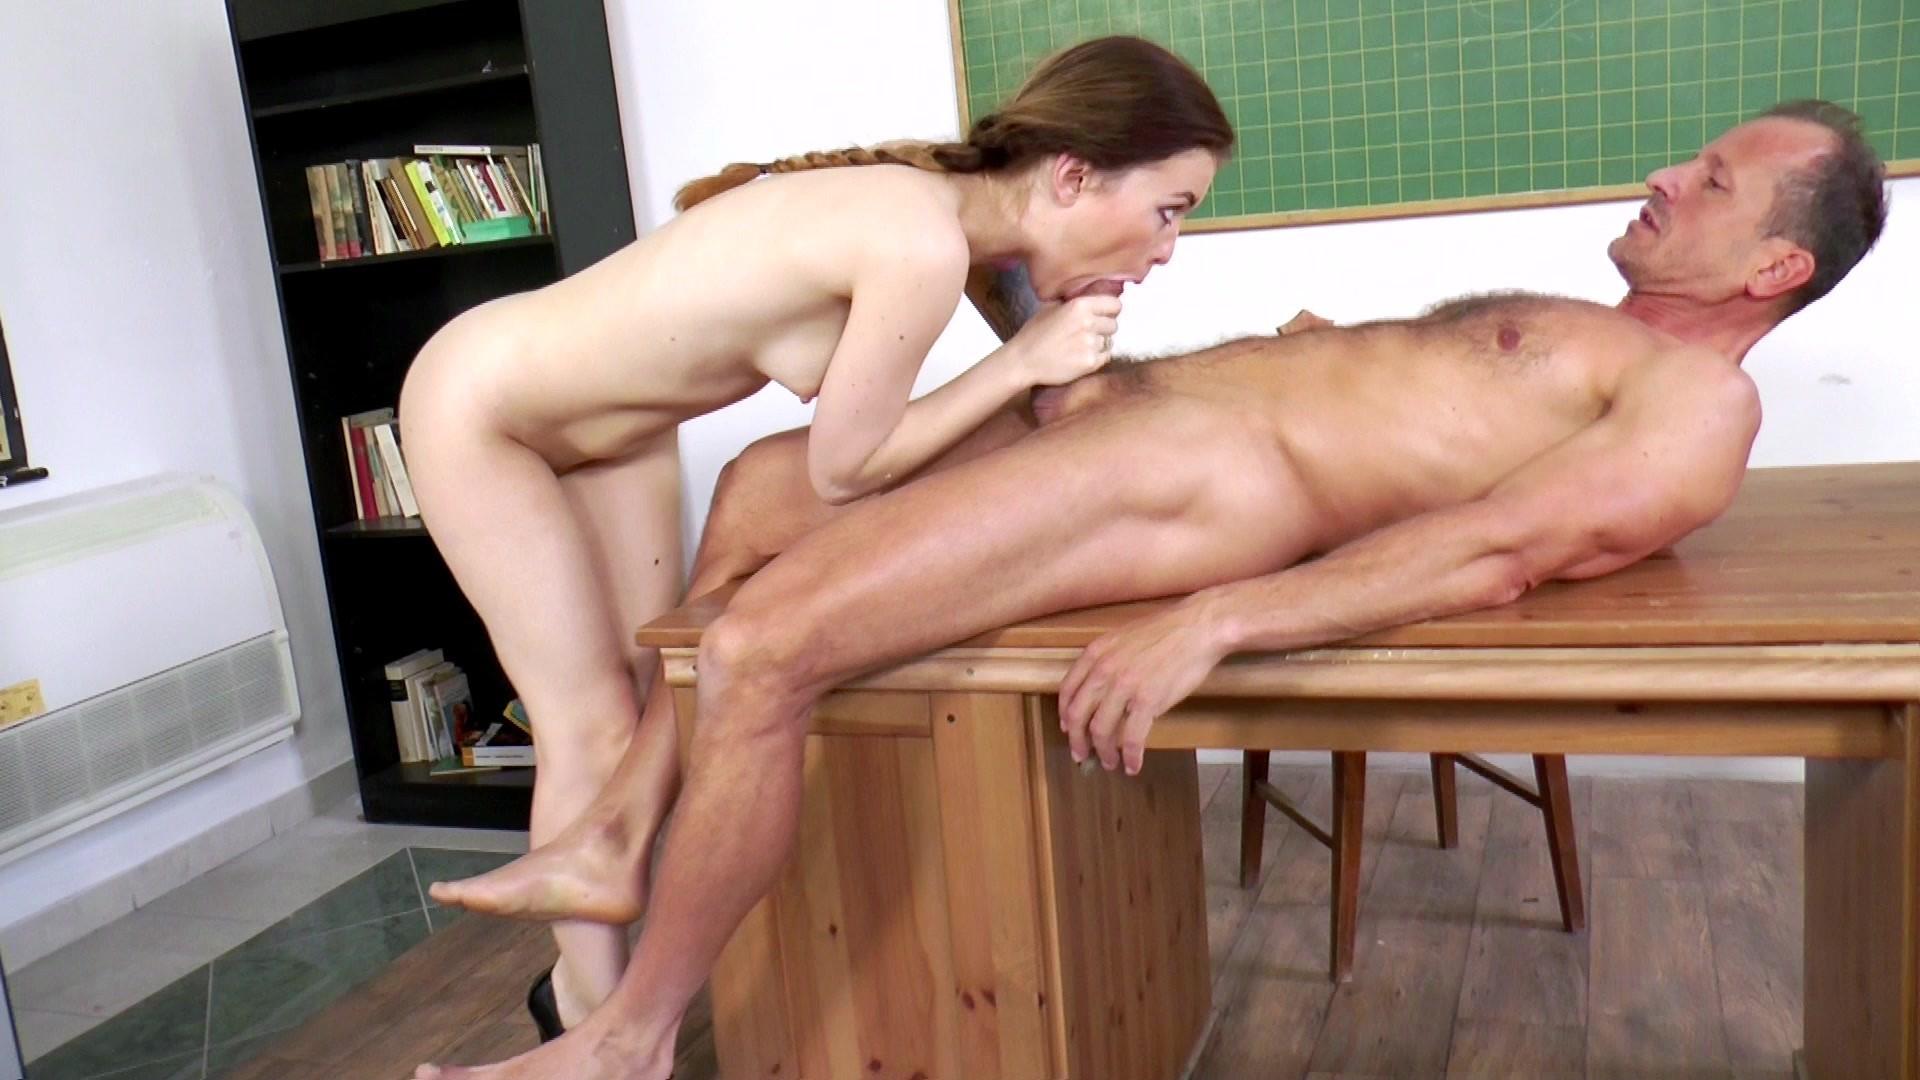 School Porn Video Download